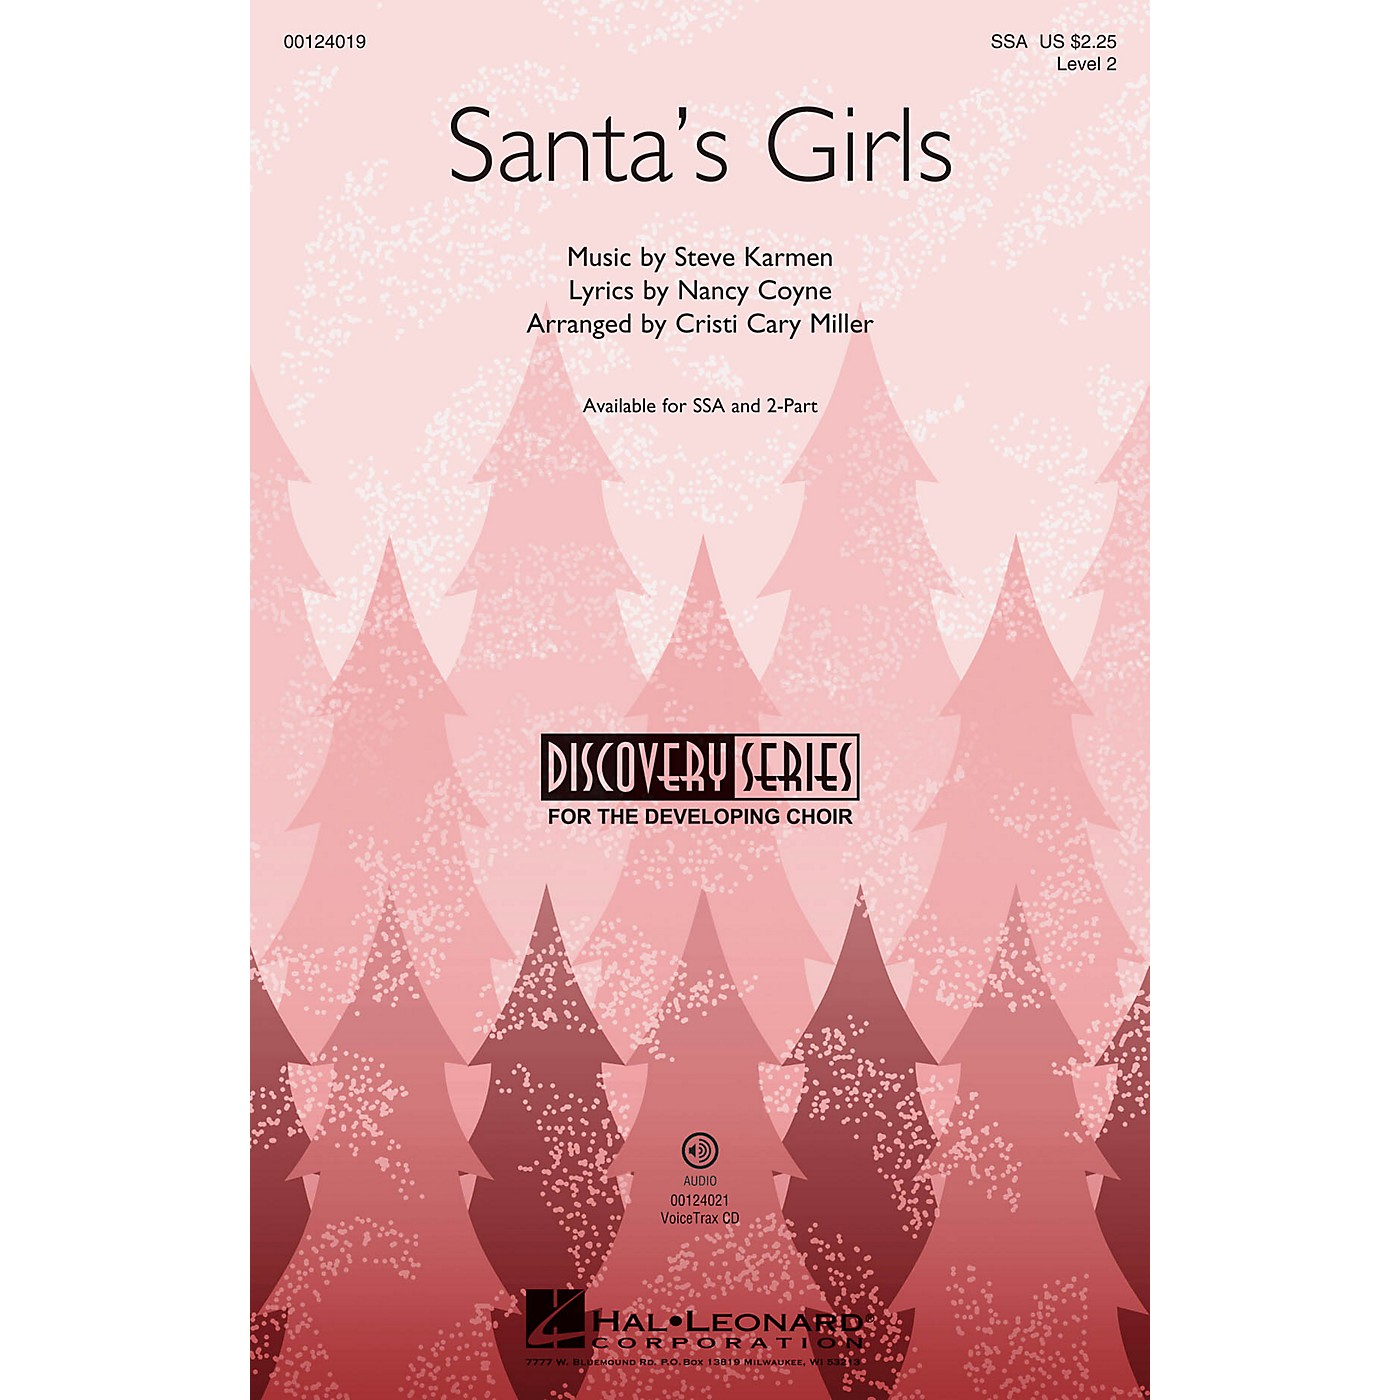 Hal Leonard Santa's Girls (Discovery Level 2) VoiceTrax CD Arranged by Cristi Cary Miller thumbnail